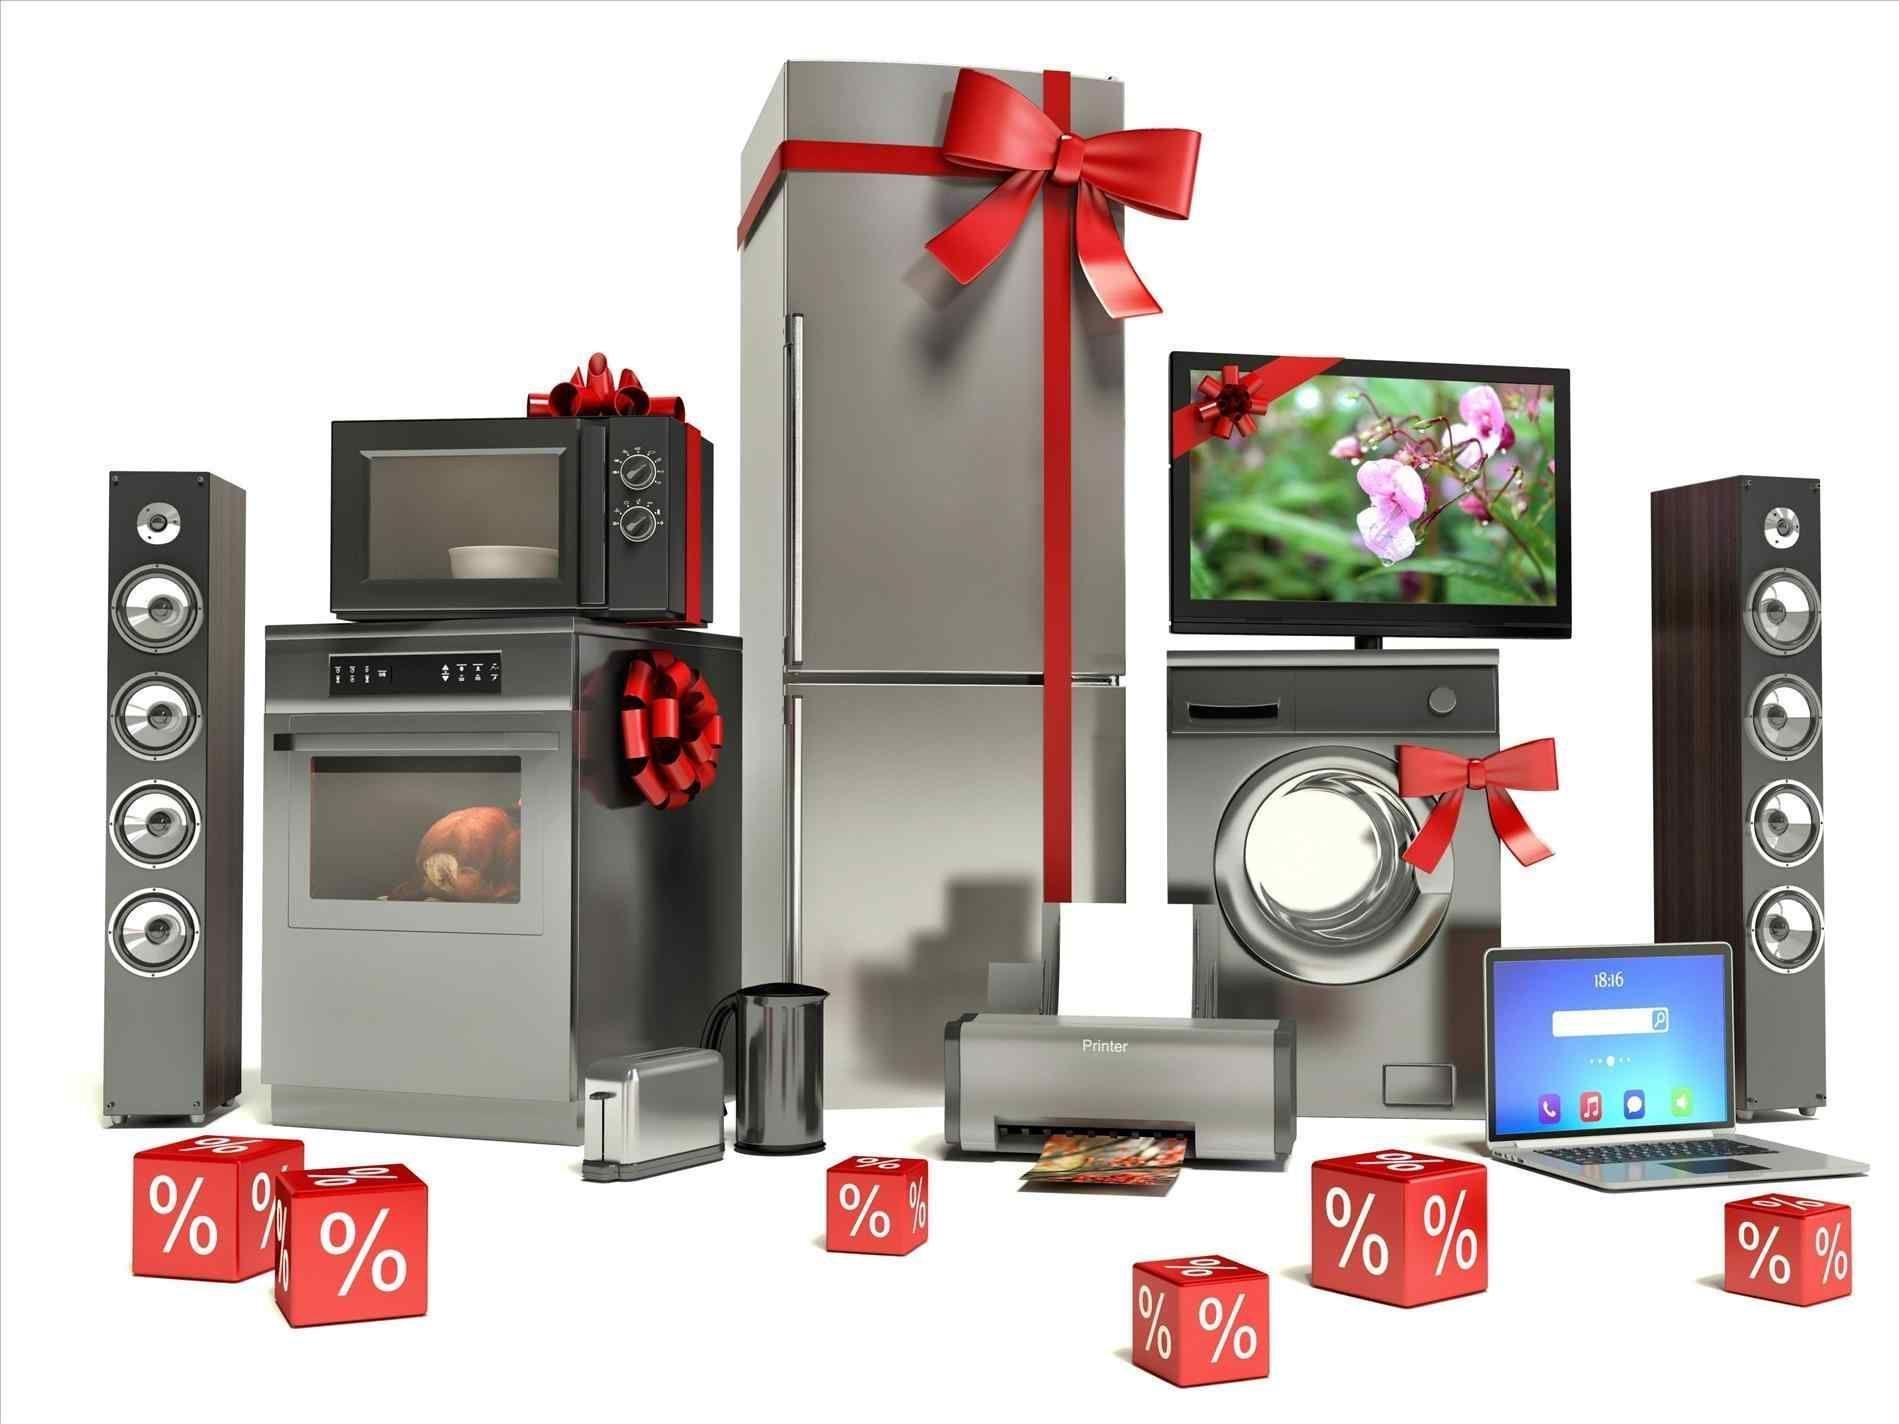 New home appliances banner hd at xx16.info #HomeAppliancesBanner ...